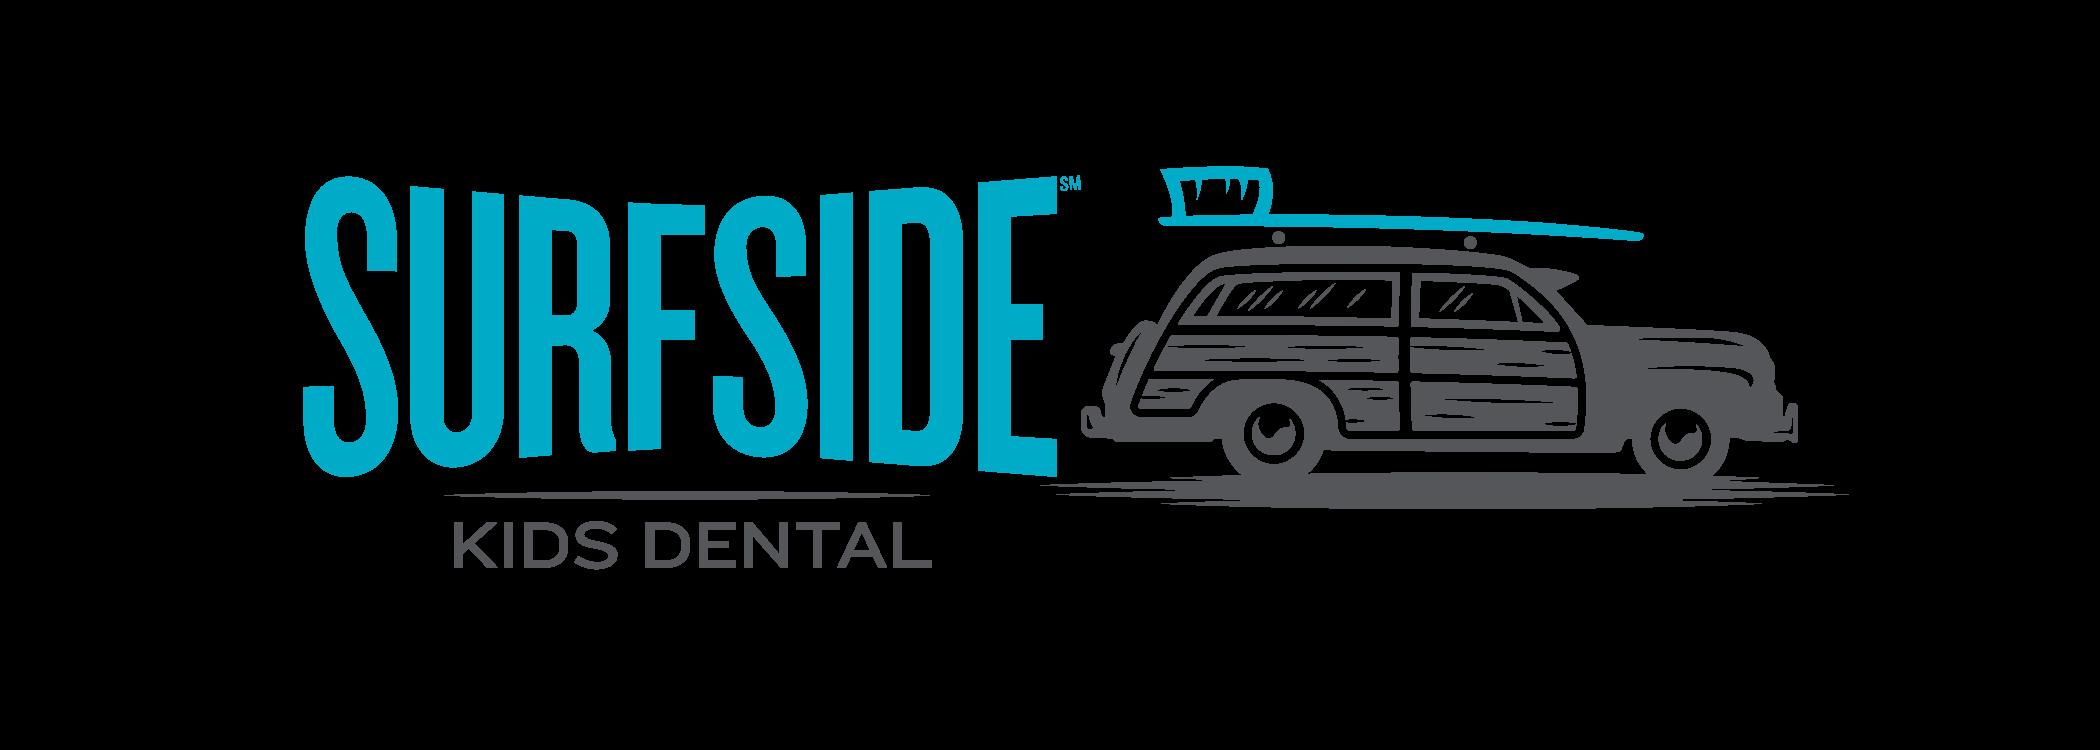 Best Kids Dentist Orthodontist in Northern California! Surf, Smile, Be Happy.